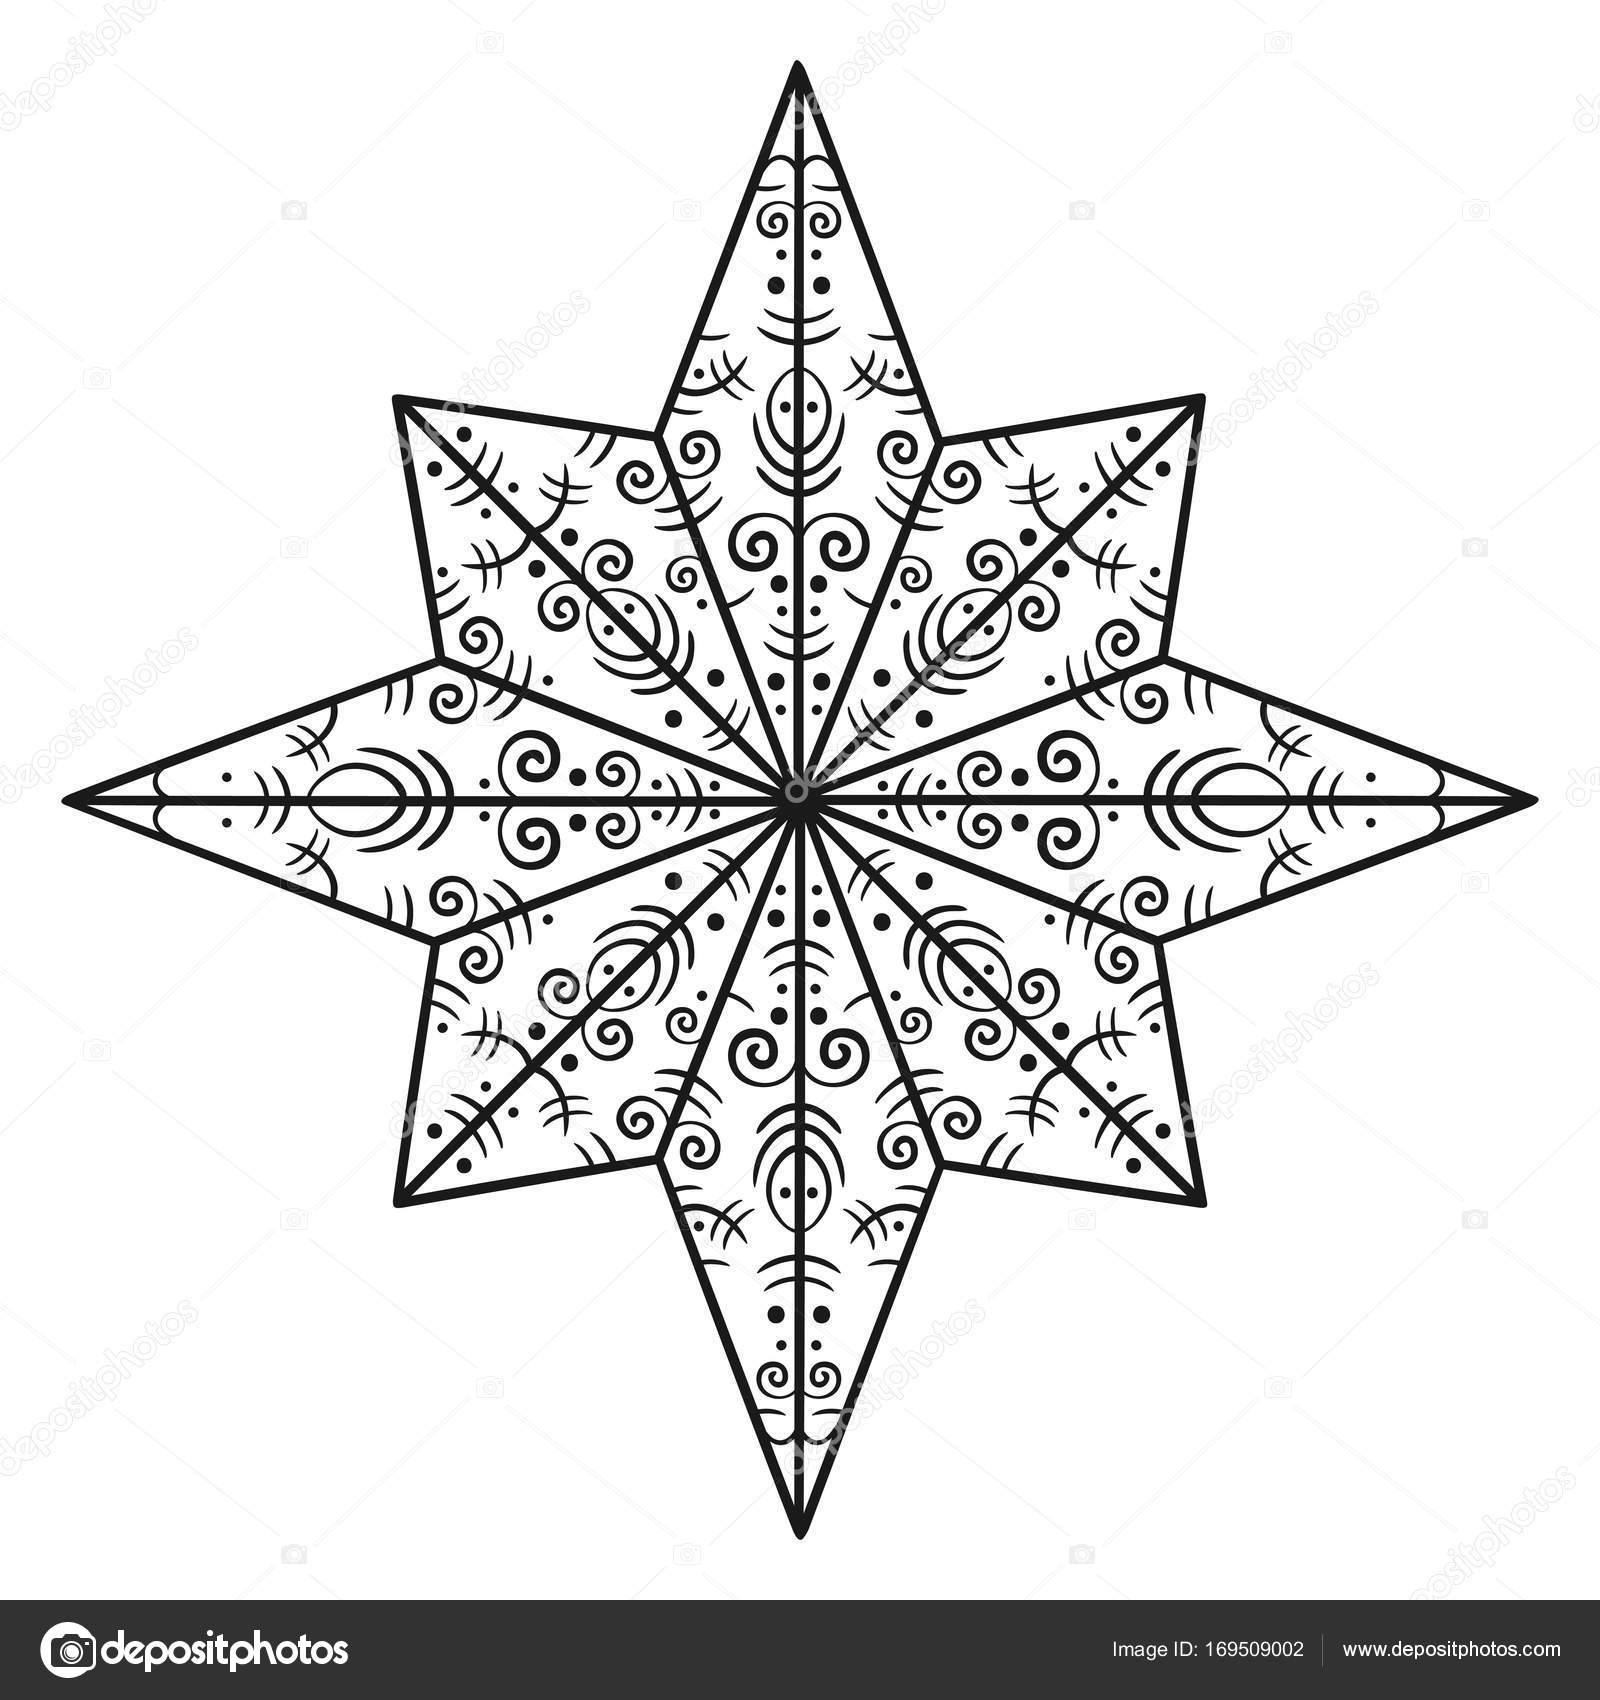 Kleurplaten Kerst Sterren.Kerstmis Sterren Kleurplaten Stockvector C Genevskayamariya 169509002